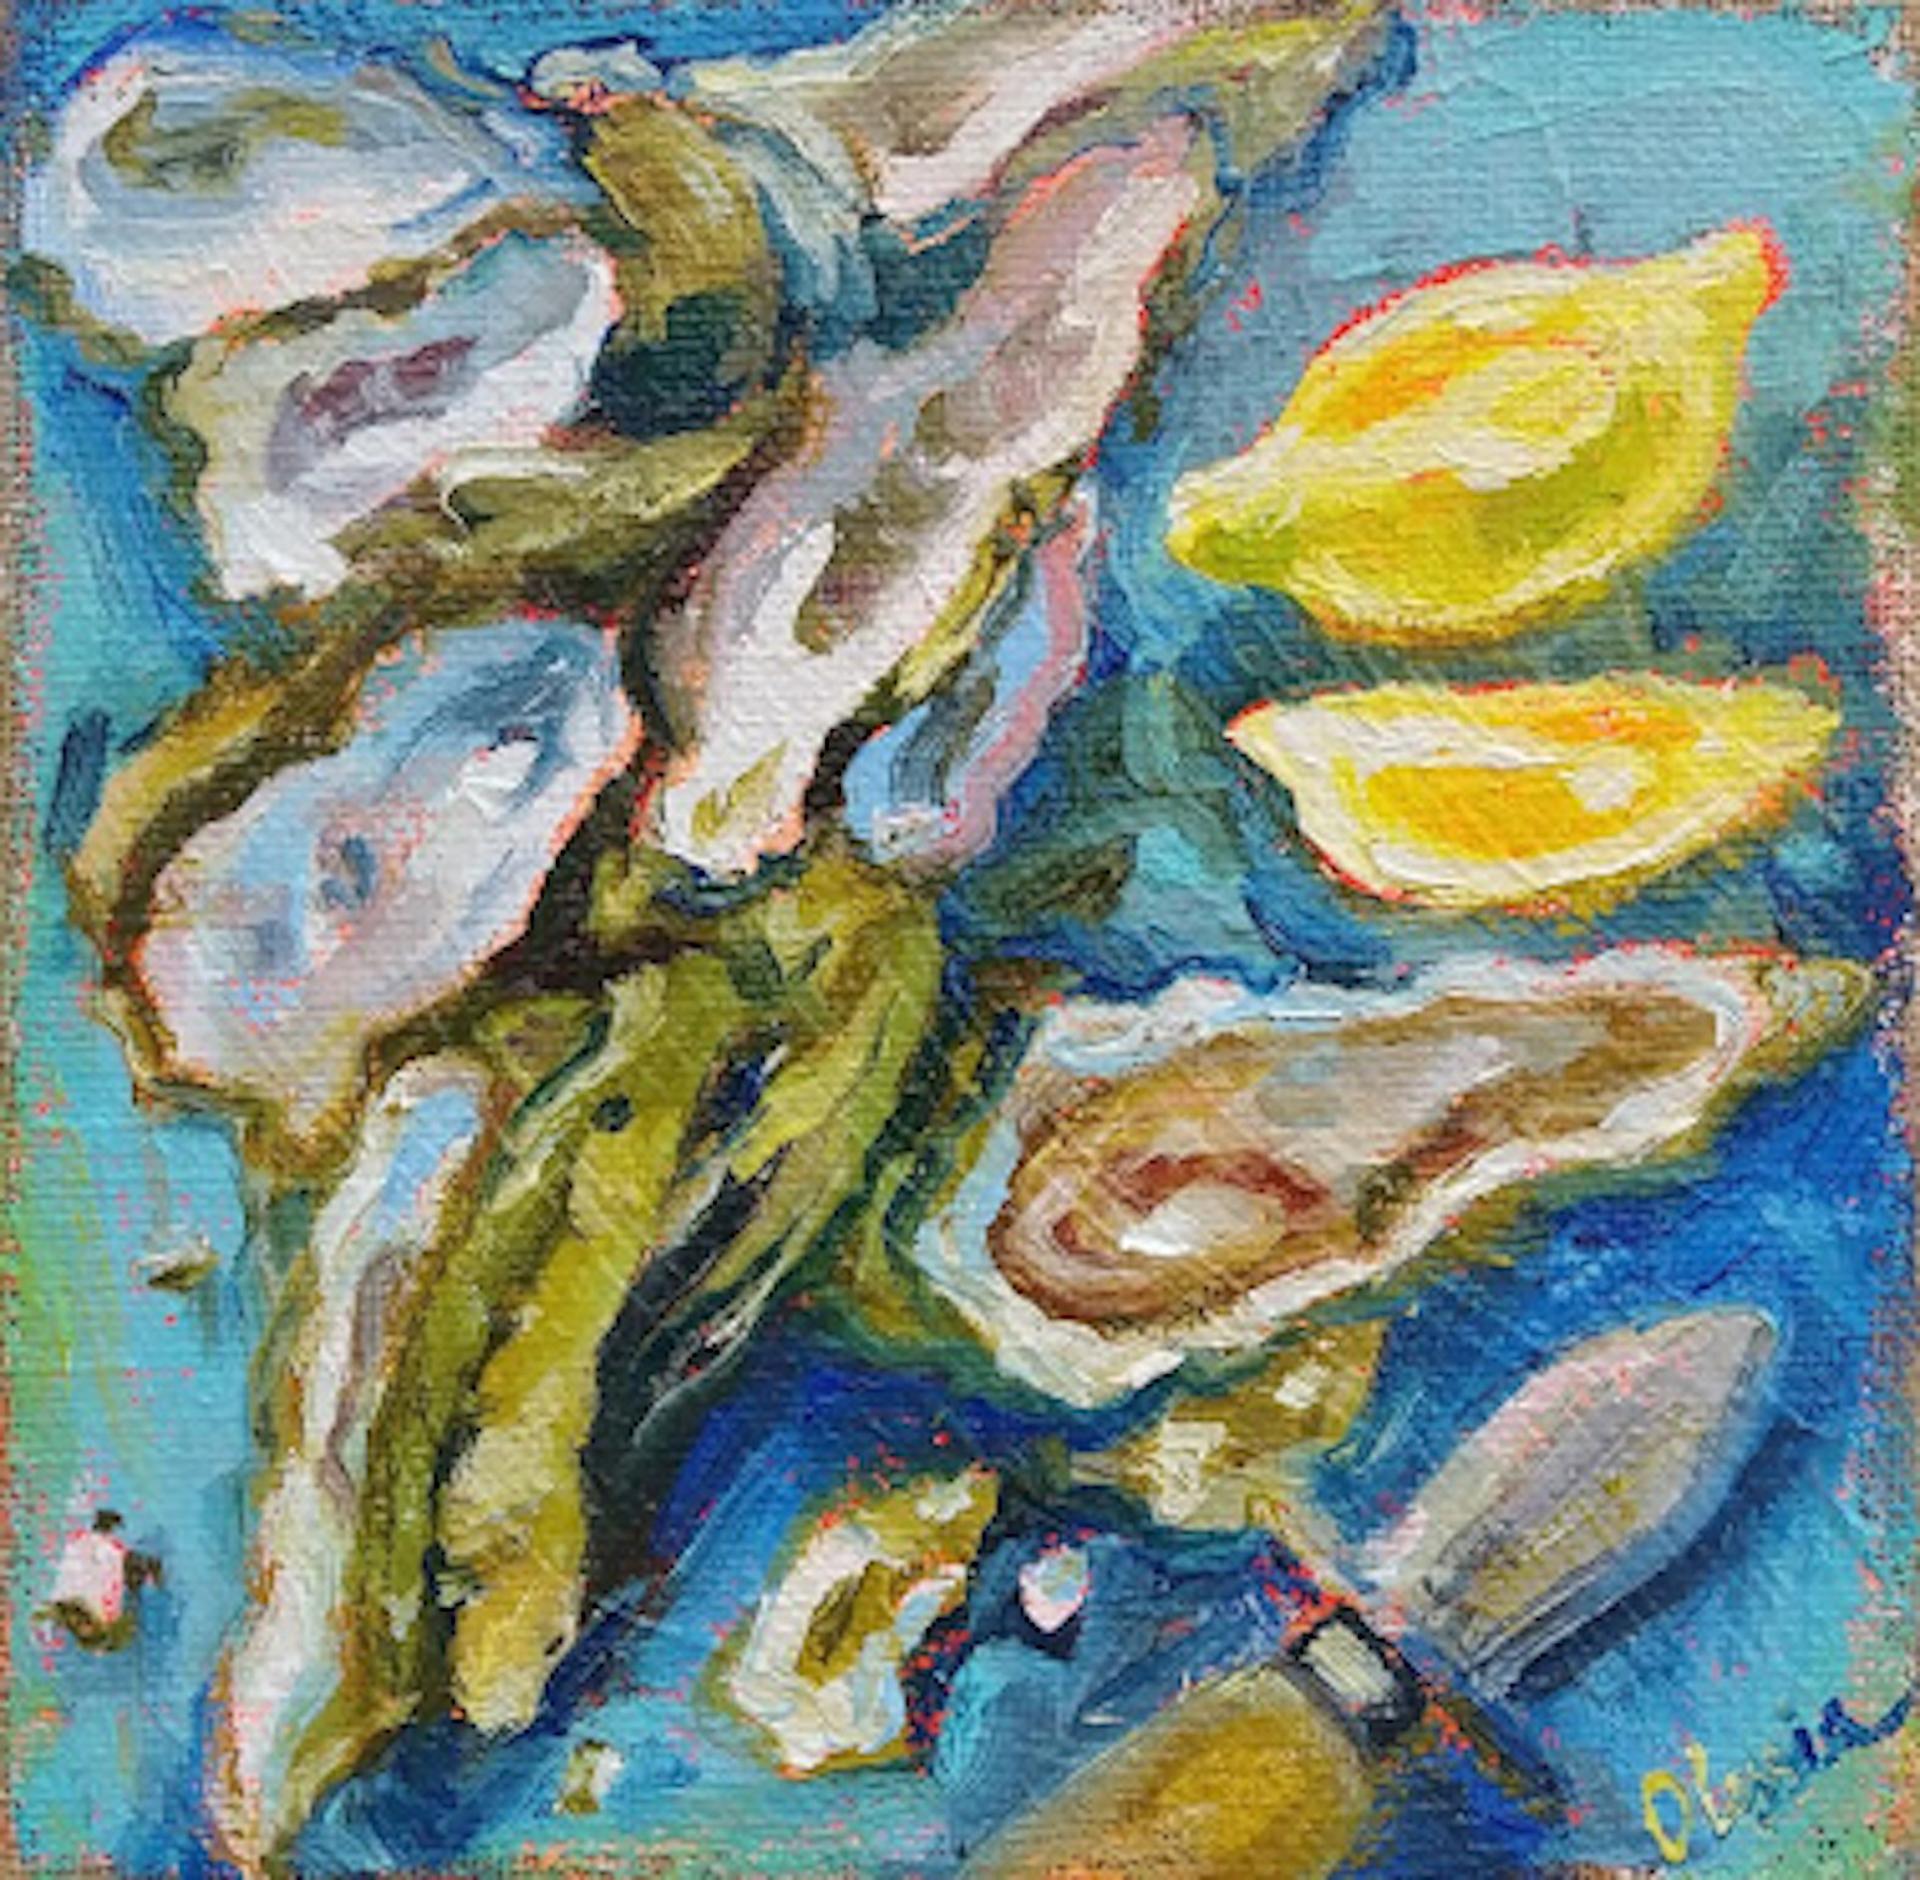 New Oystas II by Olessia Maximenko